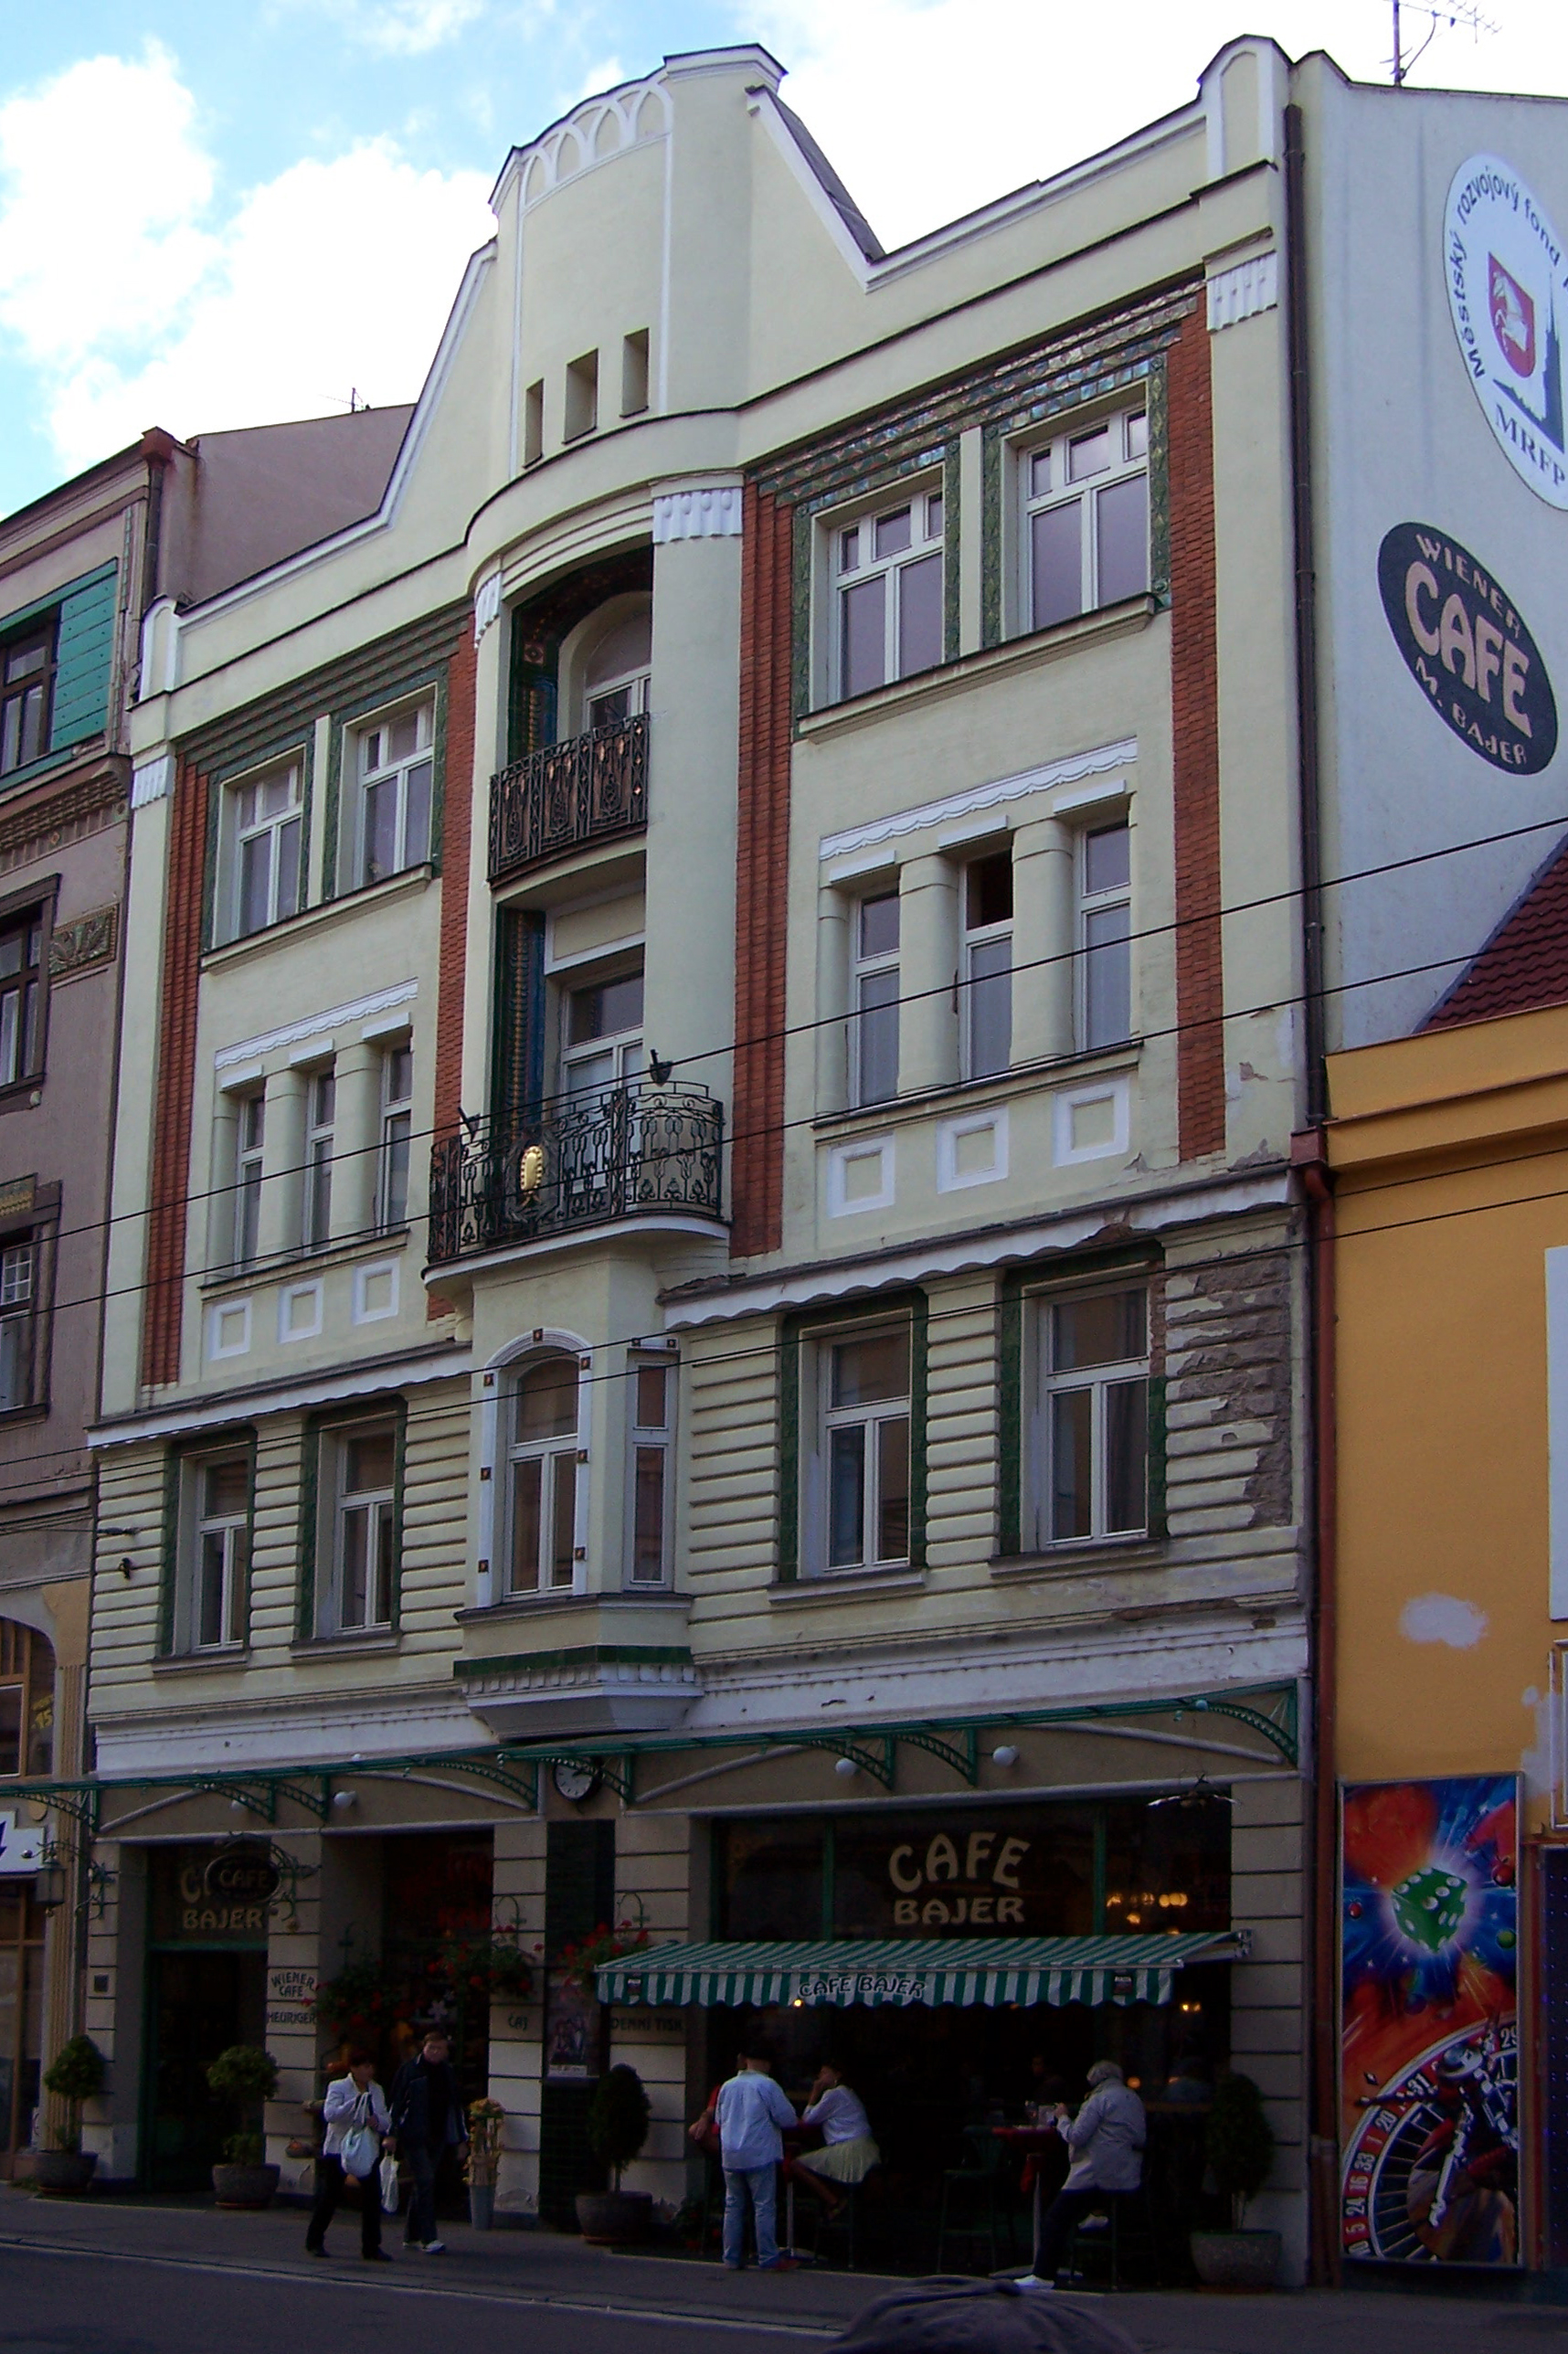 File:Tr. Miru 763, Pardubice.JPG - Wikimedia Commons